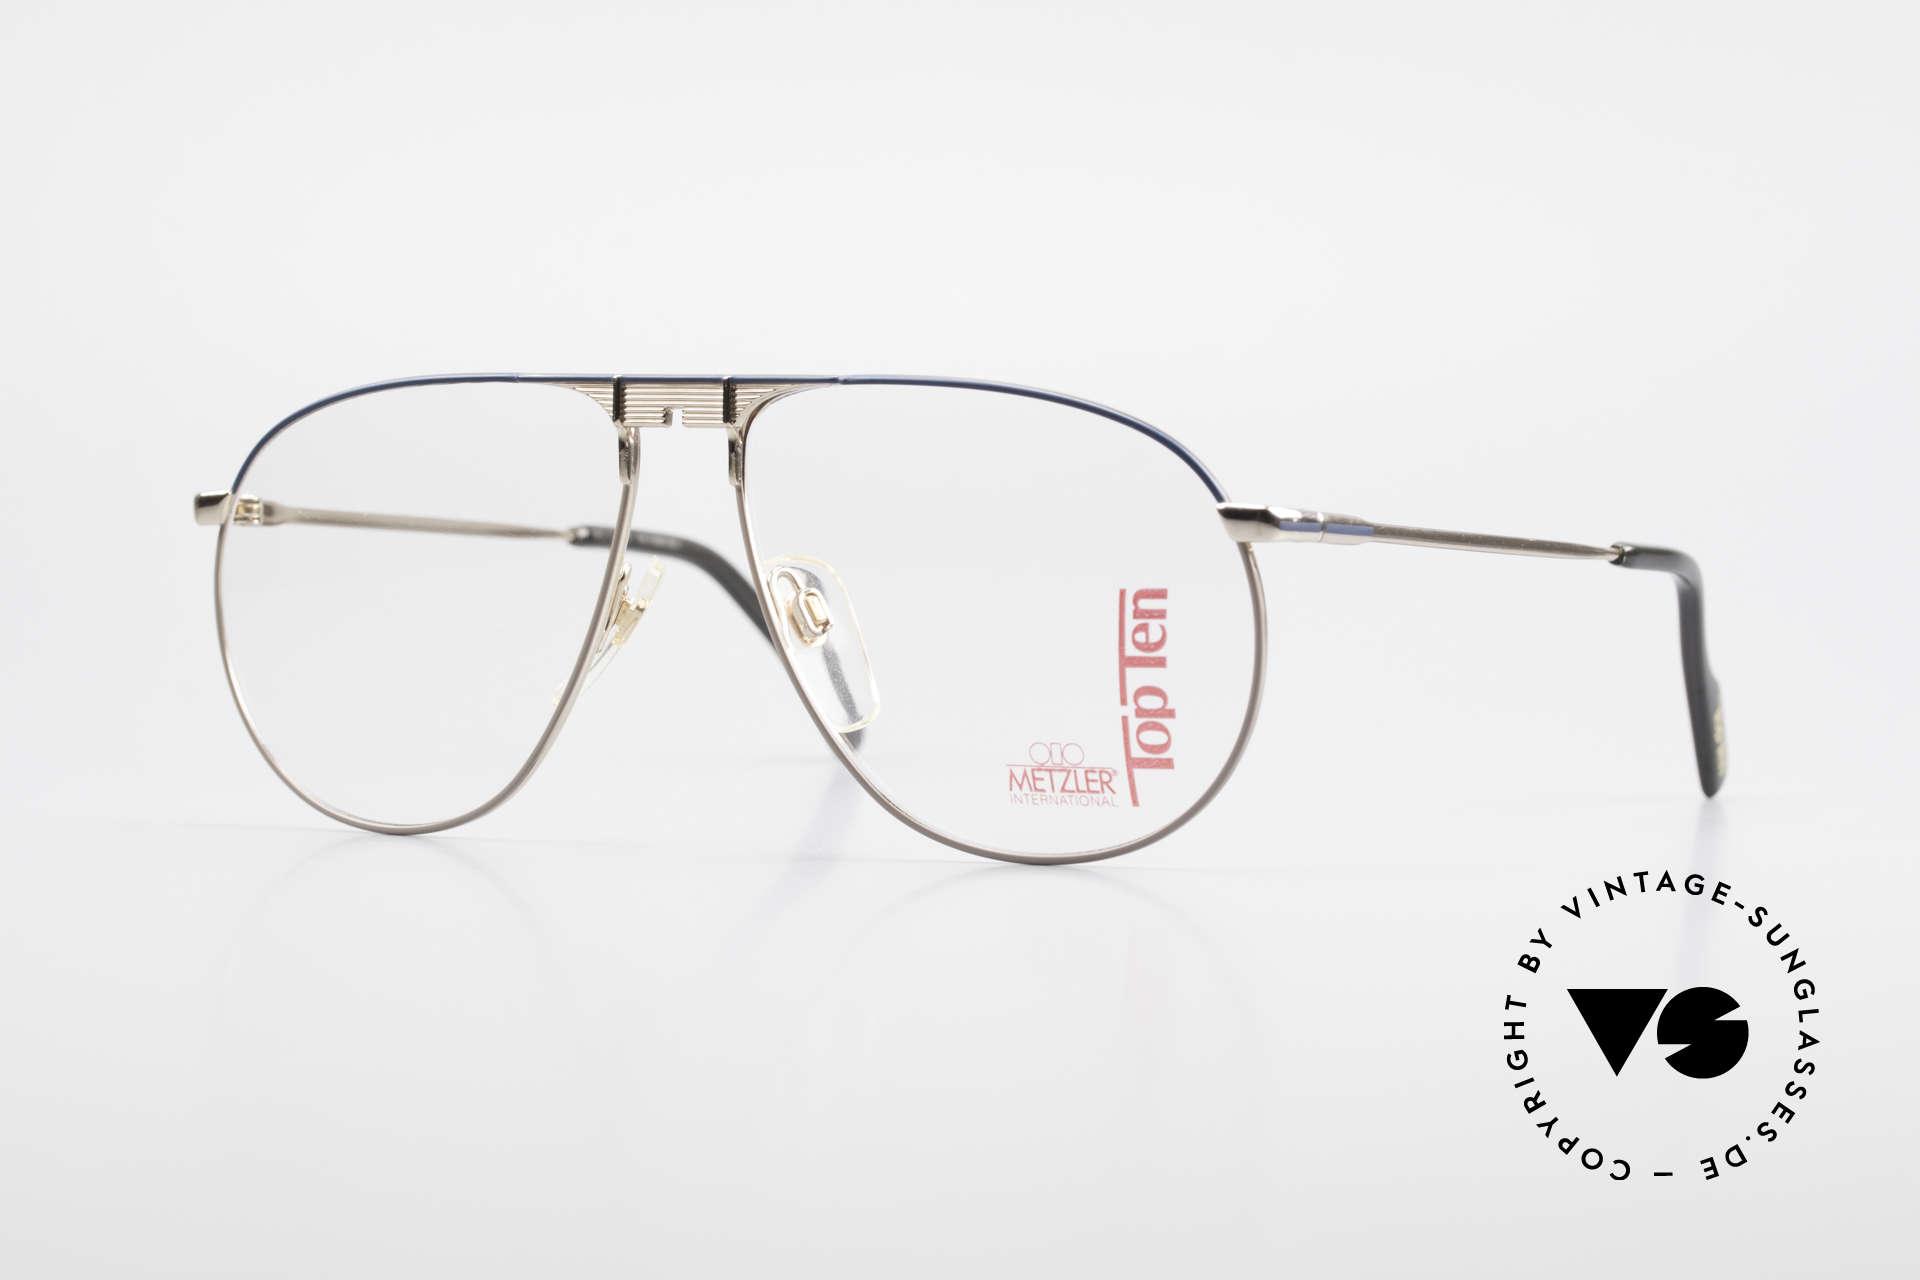 Metzler 0892 Aviator Frame Top Ten Series, delicate vintage eyeglasses for gentlemen by Metzler, Made for Men